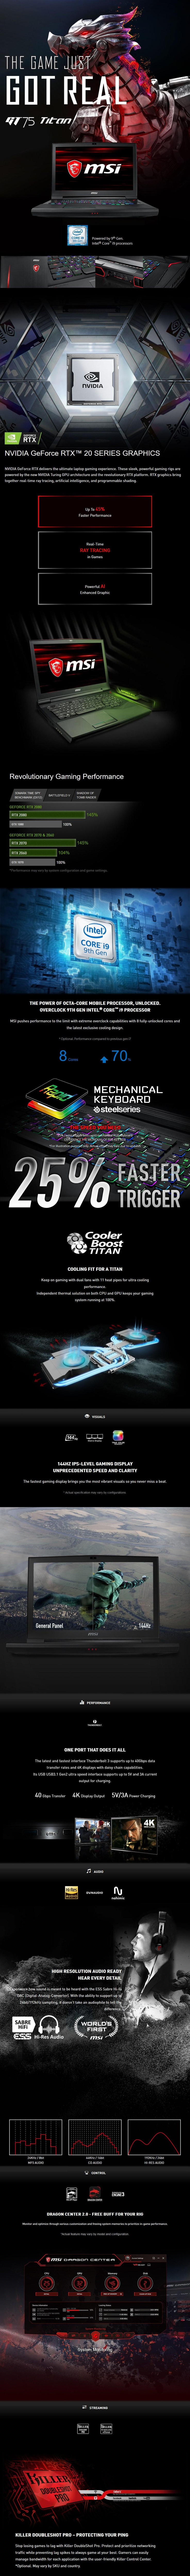 "MSI GT75 Titan 9SF 17.3"" 144Hz Gaming Laptop i9-9980HK 32GB 512GB+1TB RTX2070 - Overview 1"